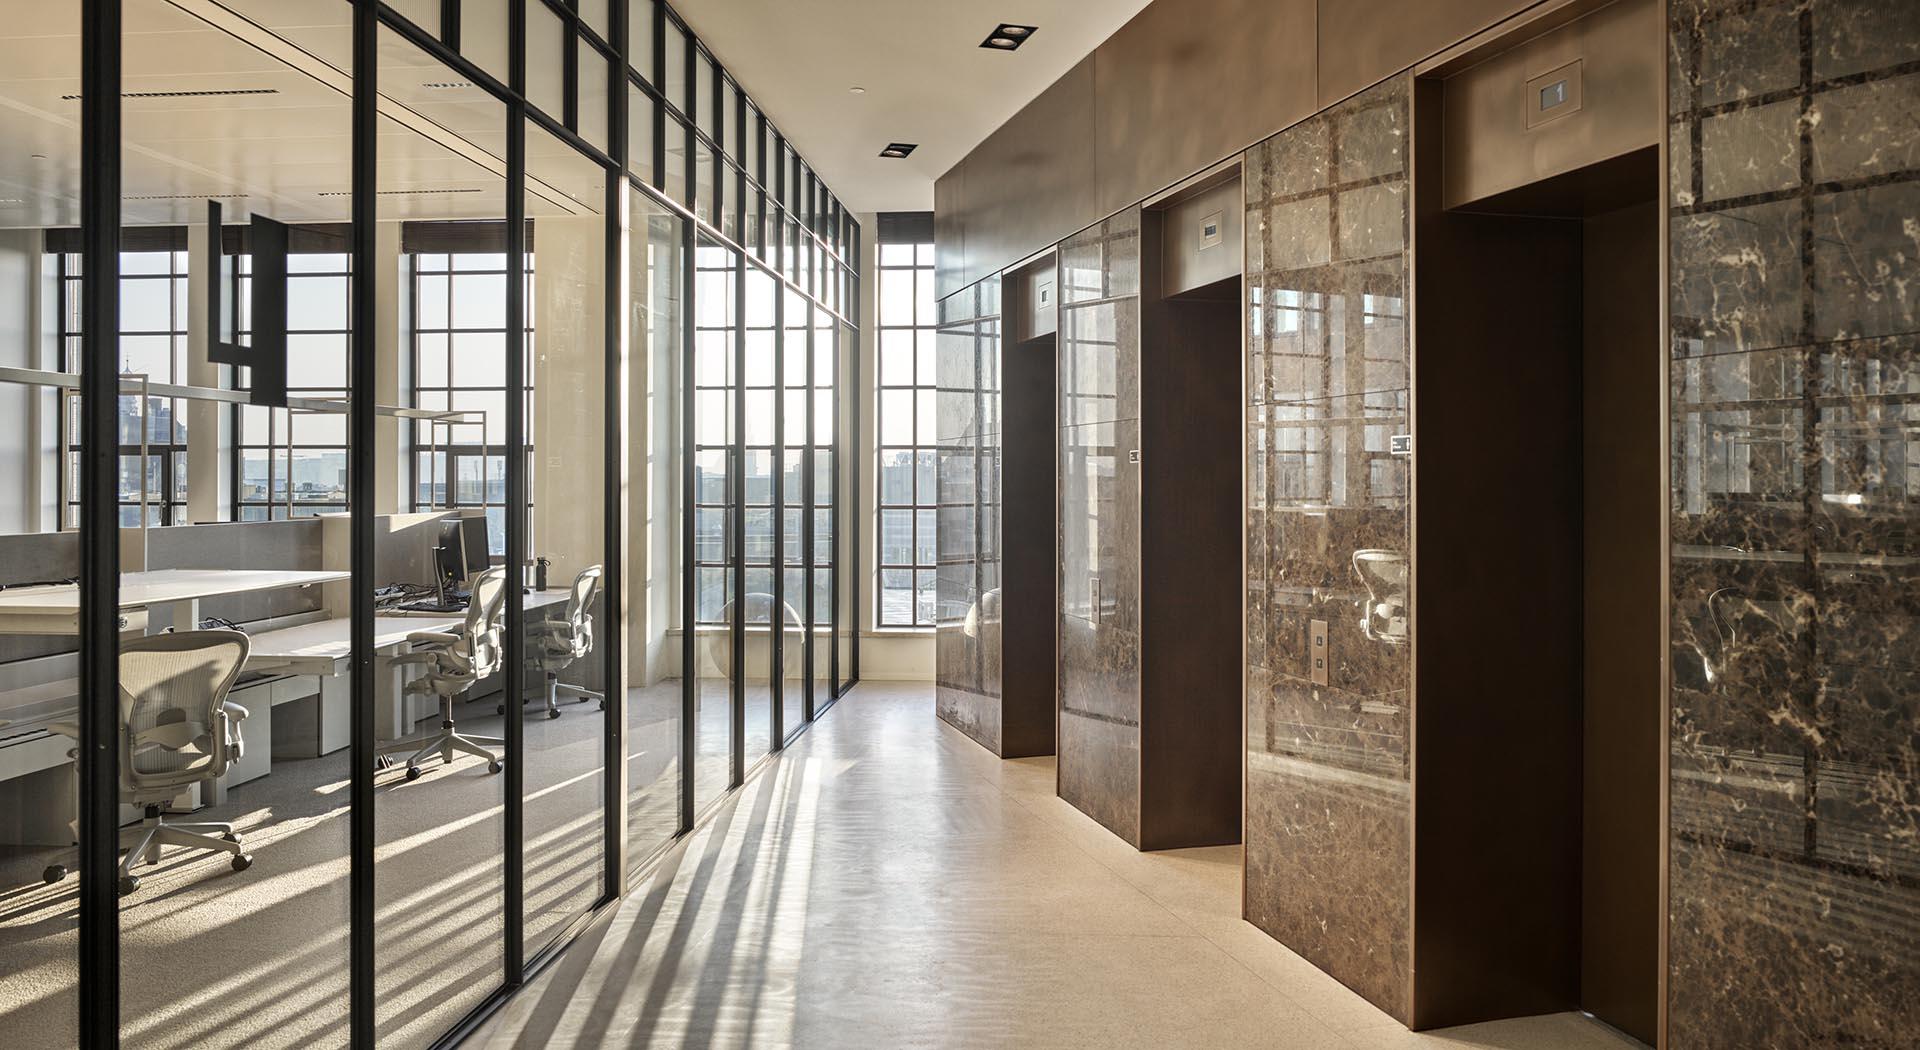 Kasbank-Amsterdam-MHB-steel-windows-sl30-guerilla-games